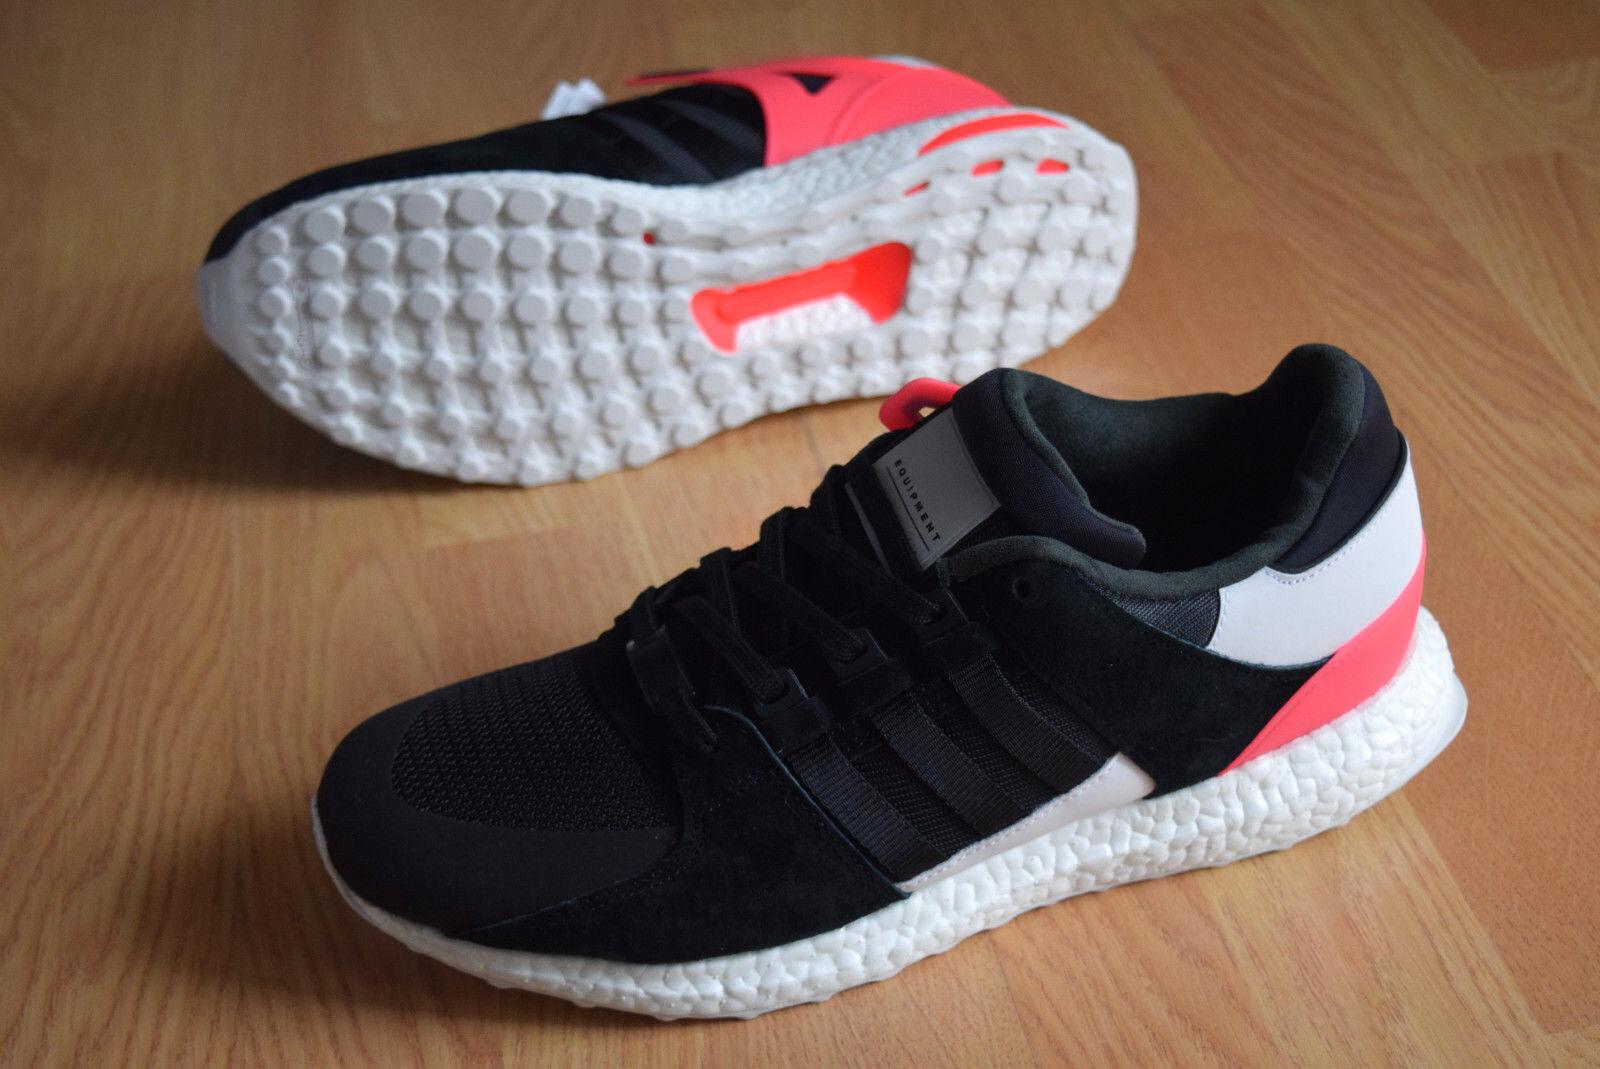 Adidas Equipment Support Ultra 40 41 42 43 44 45  BB1237 cOnSorTium Pure Boost